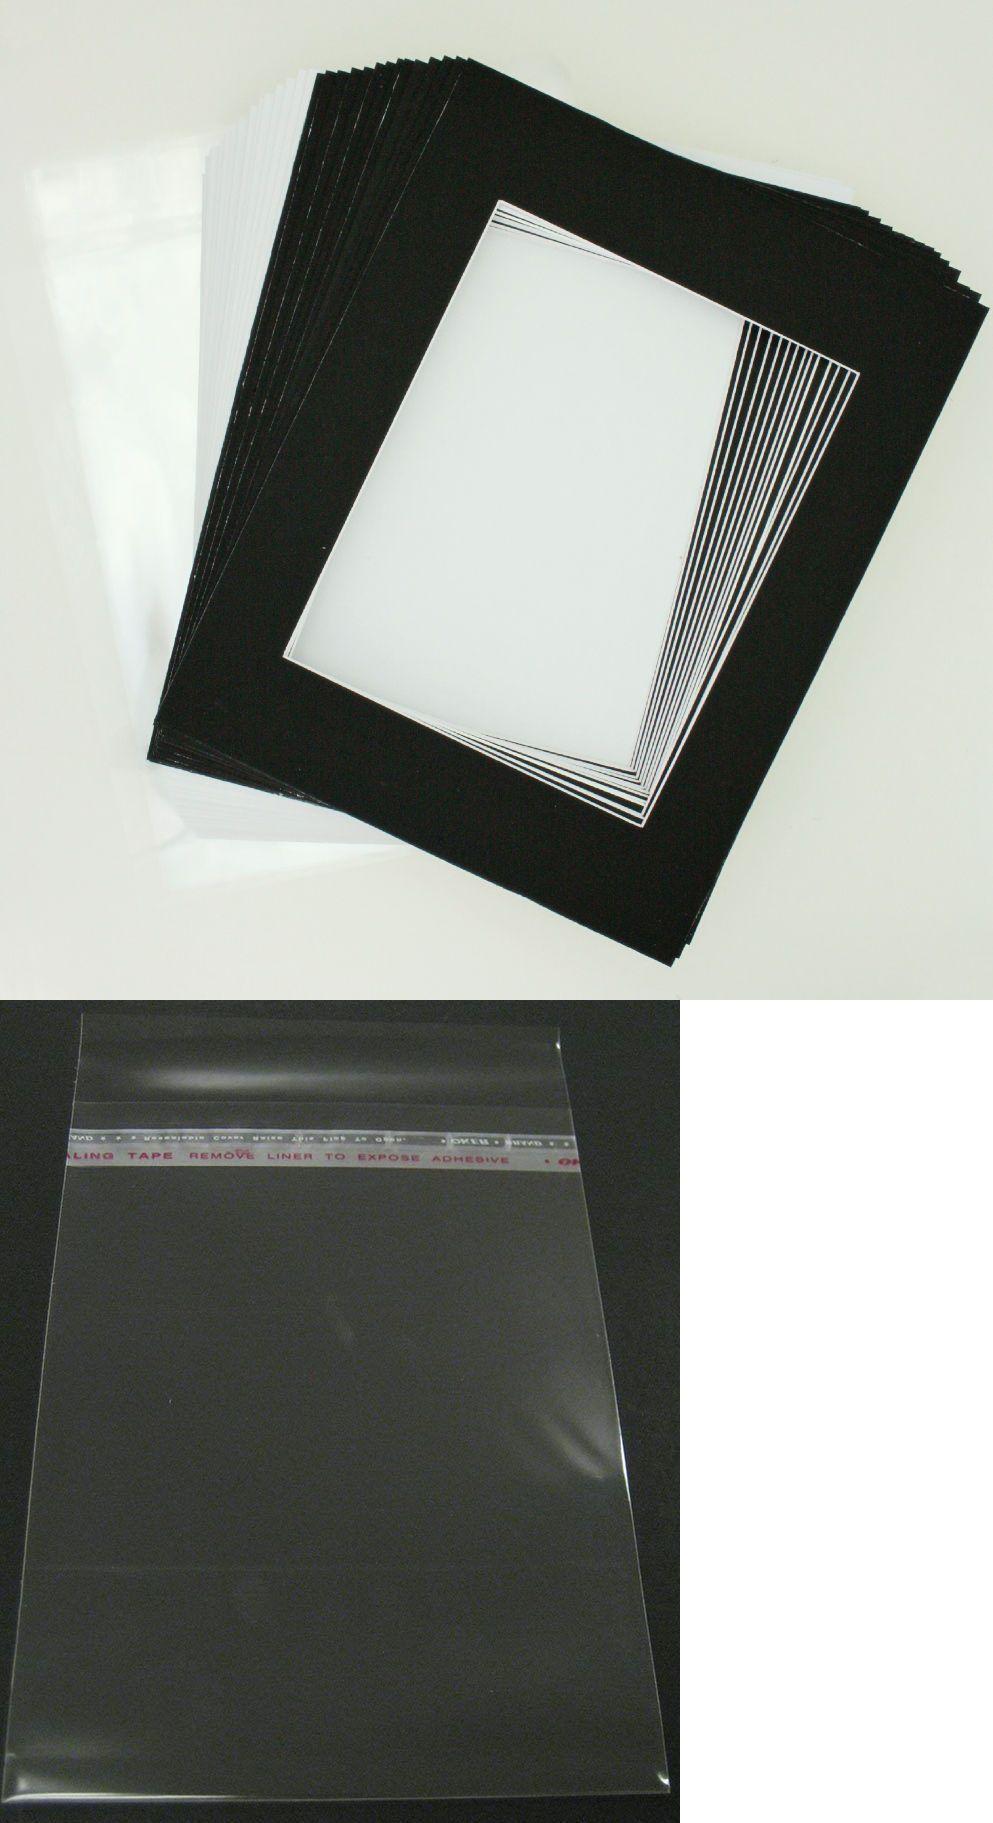 framing mats 37576 50 8 x10 matte black picture mat set white core